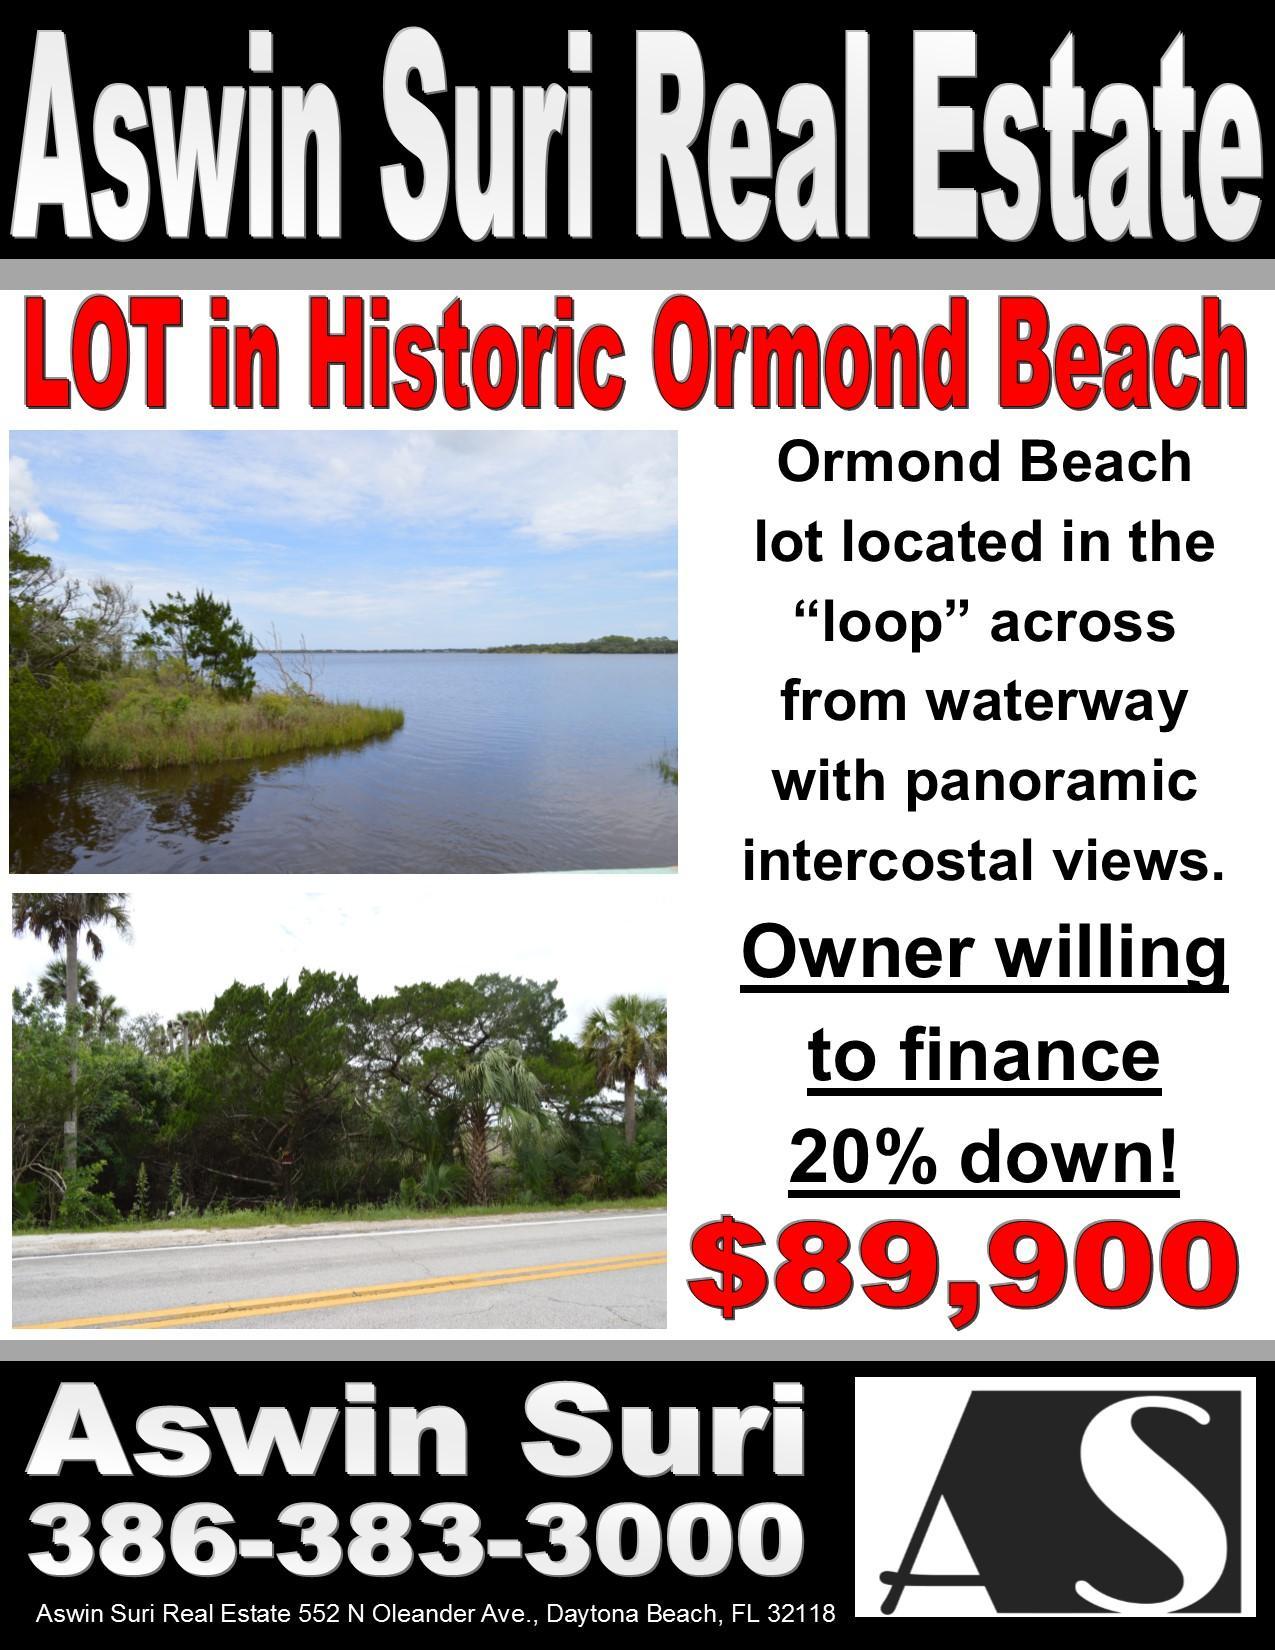 Aswin Suri Real Estate